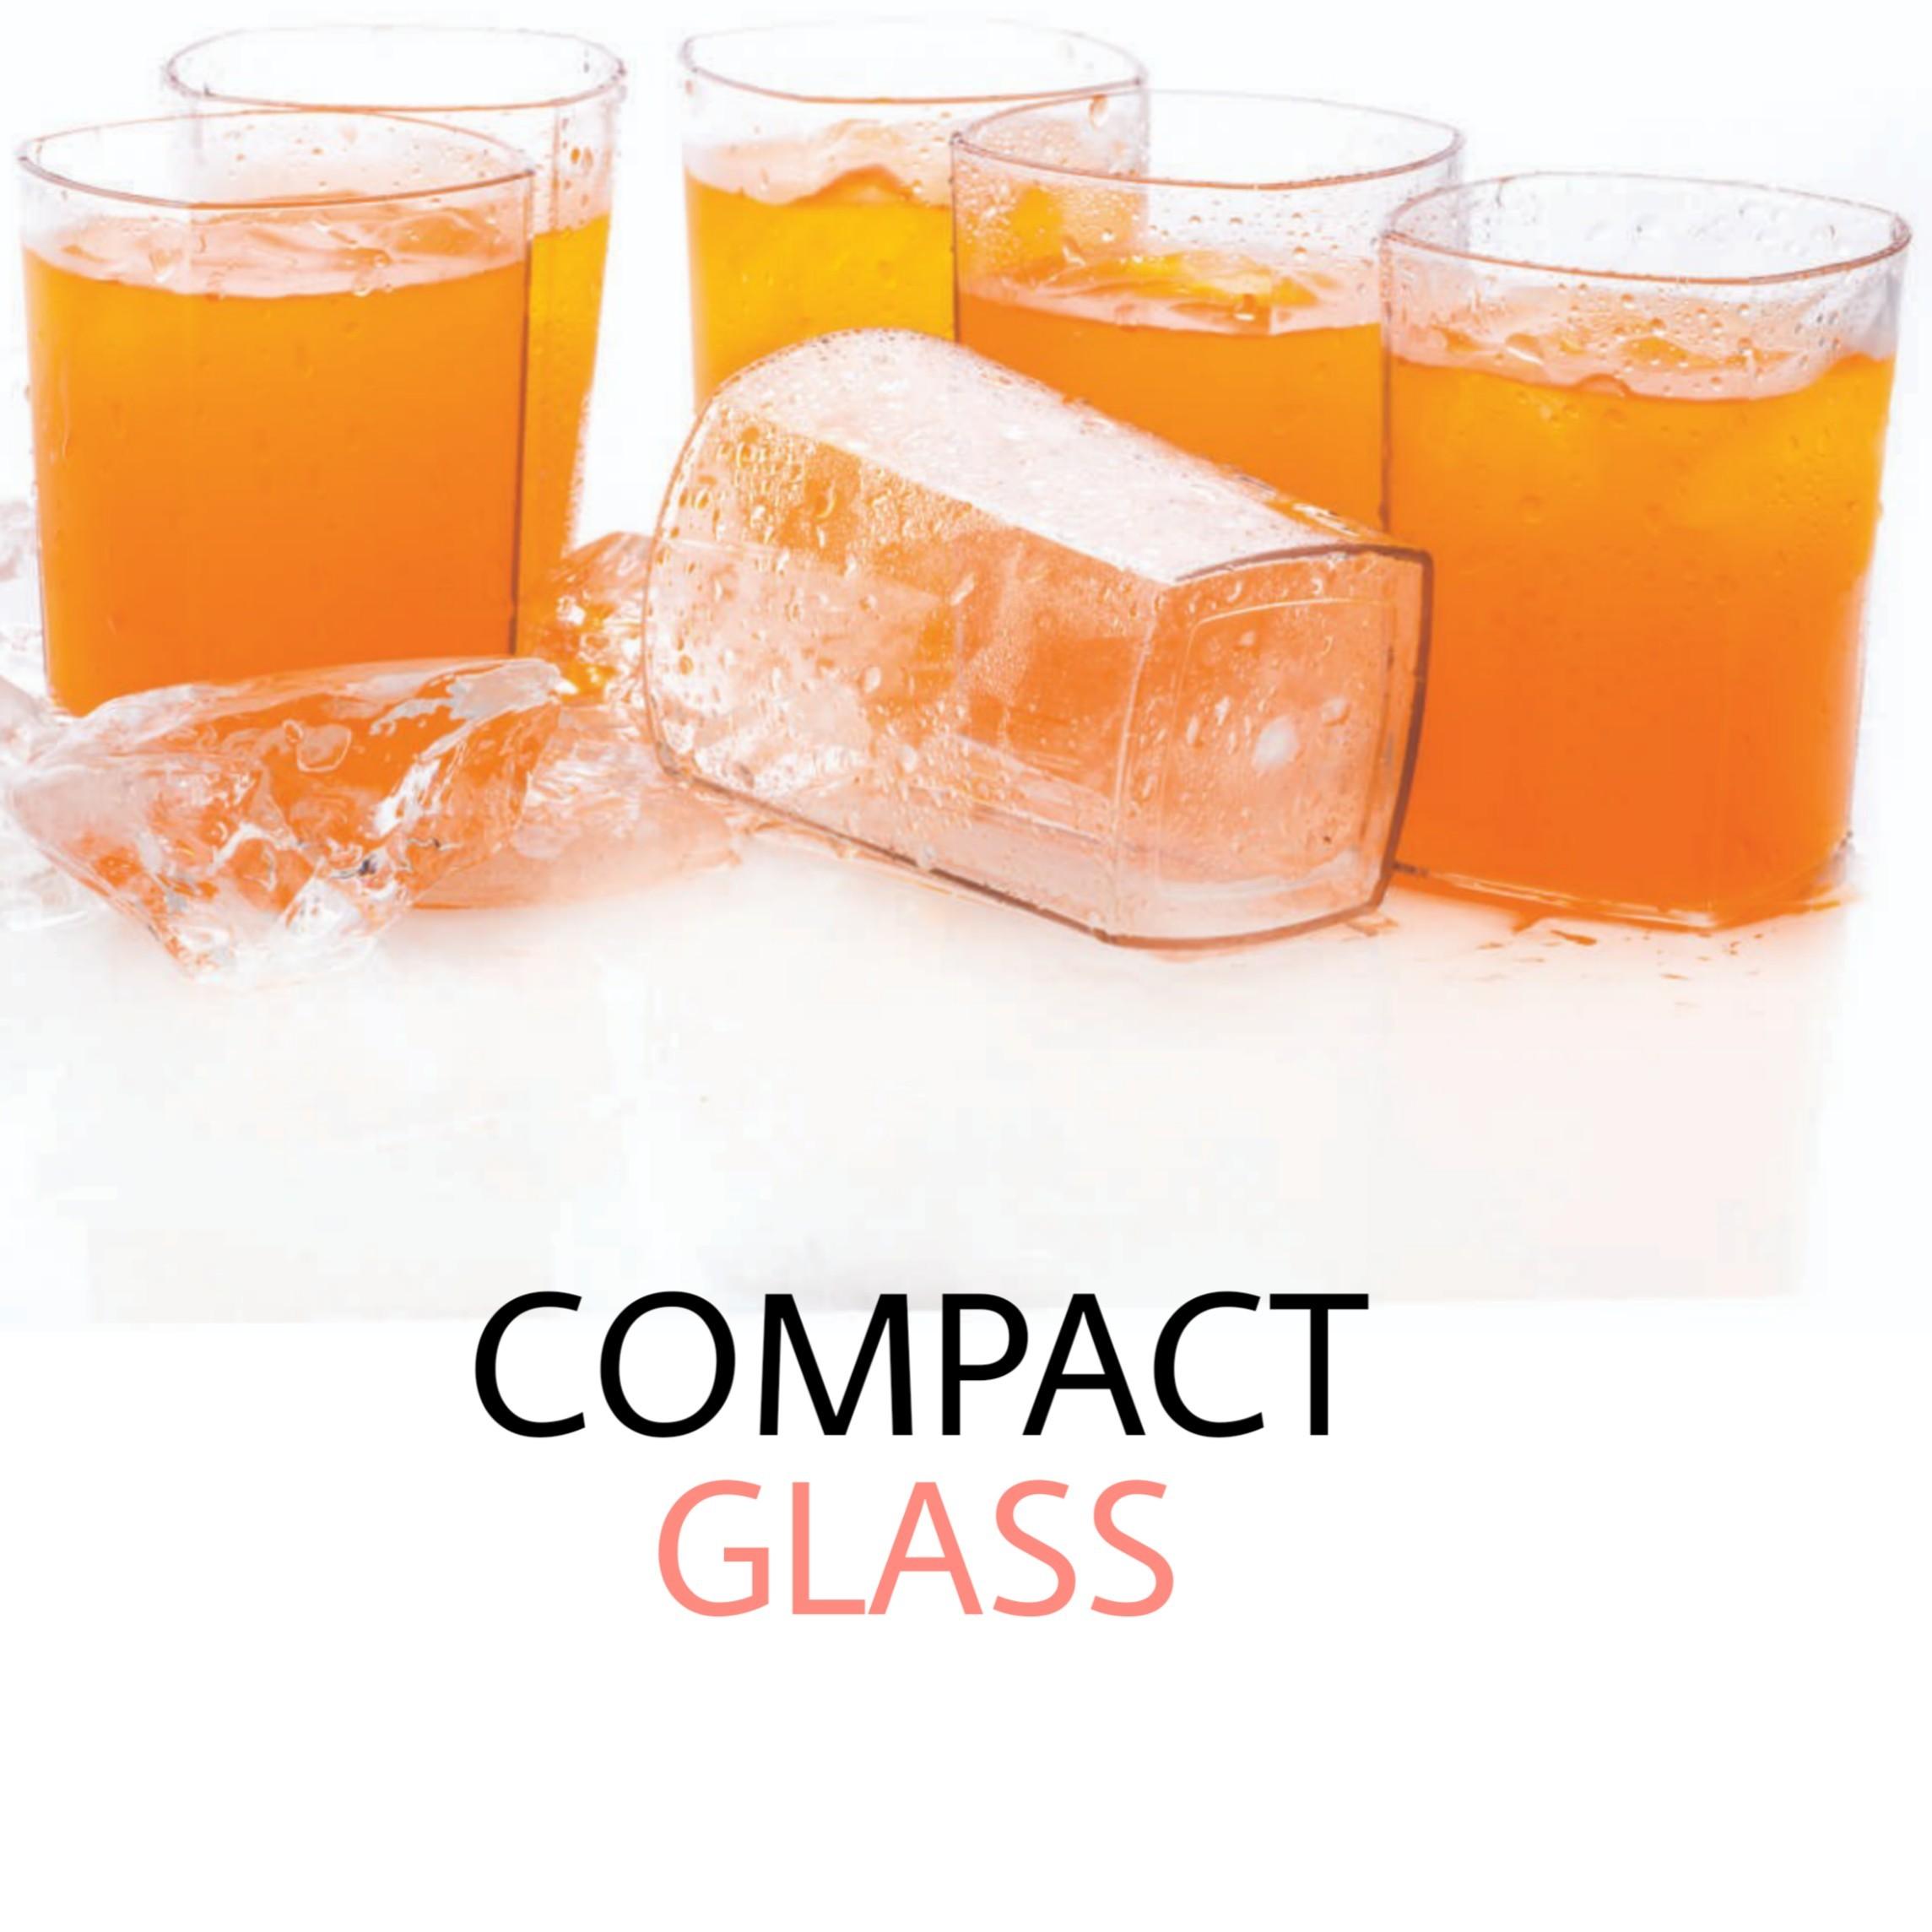 310 ml Plain Glass